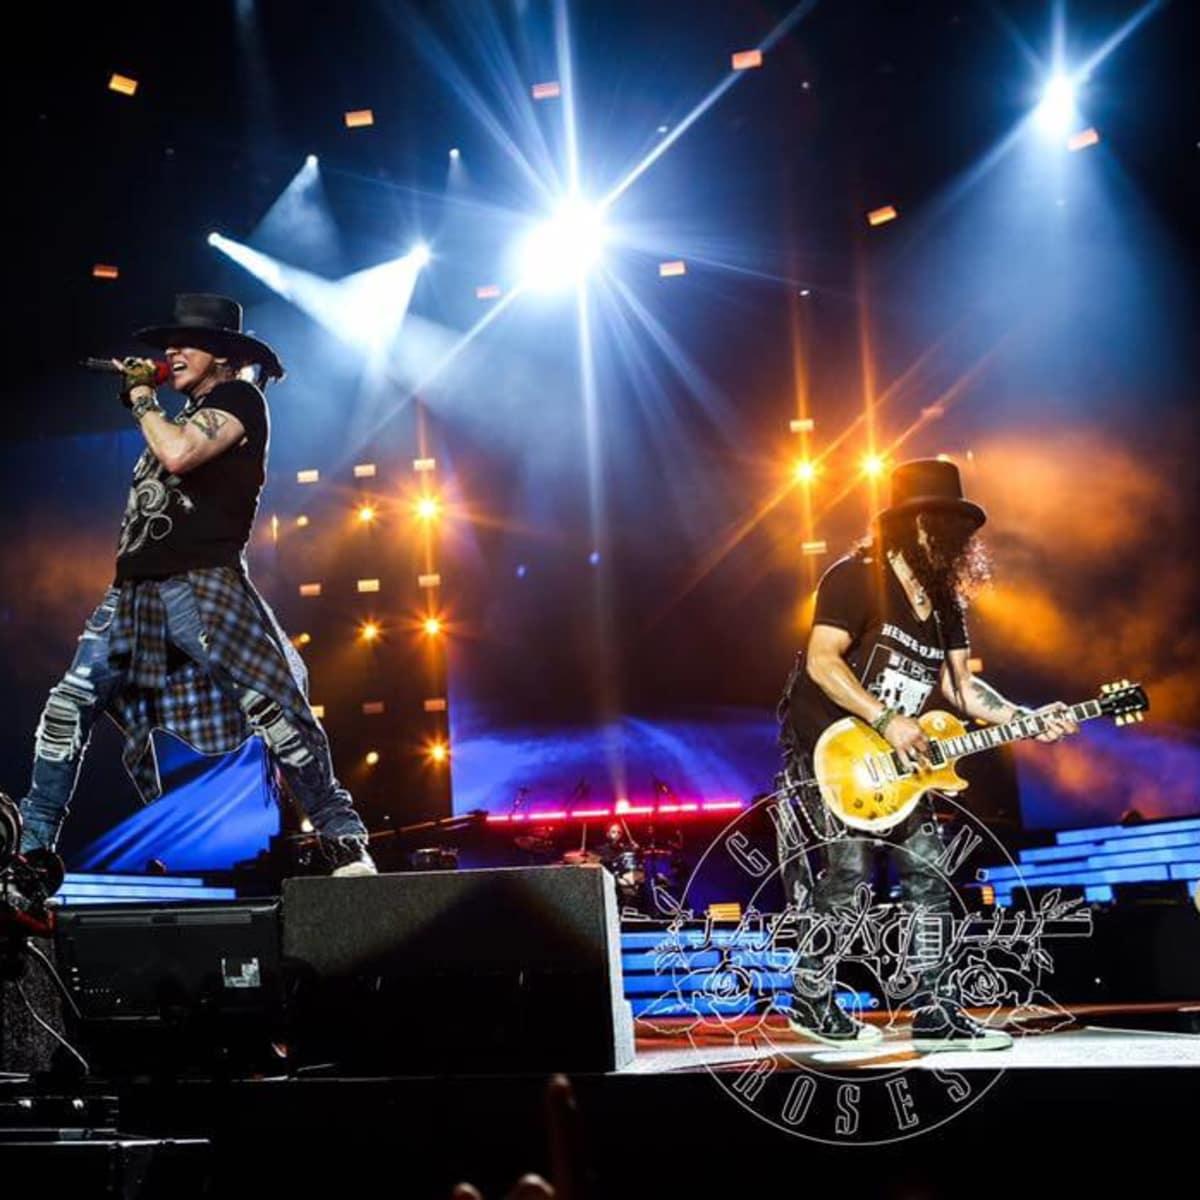 Guns N Roses at Arlington concert